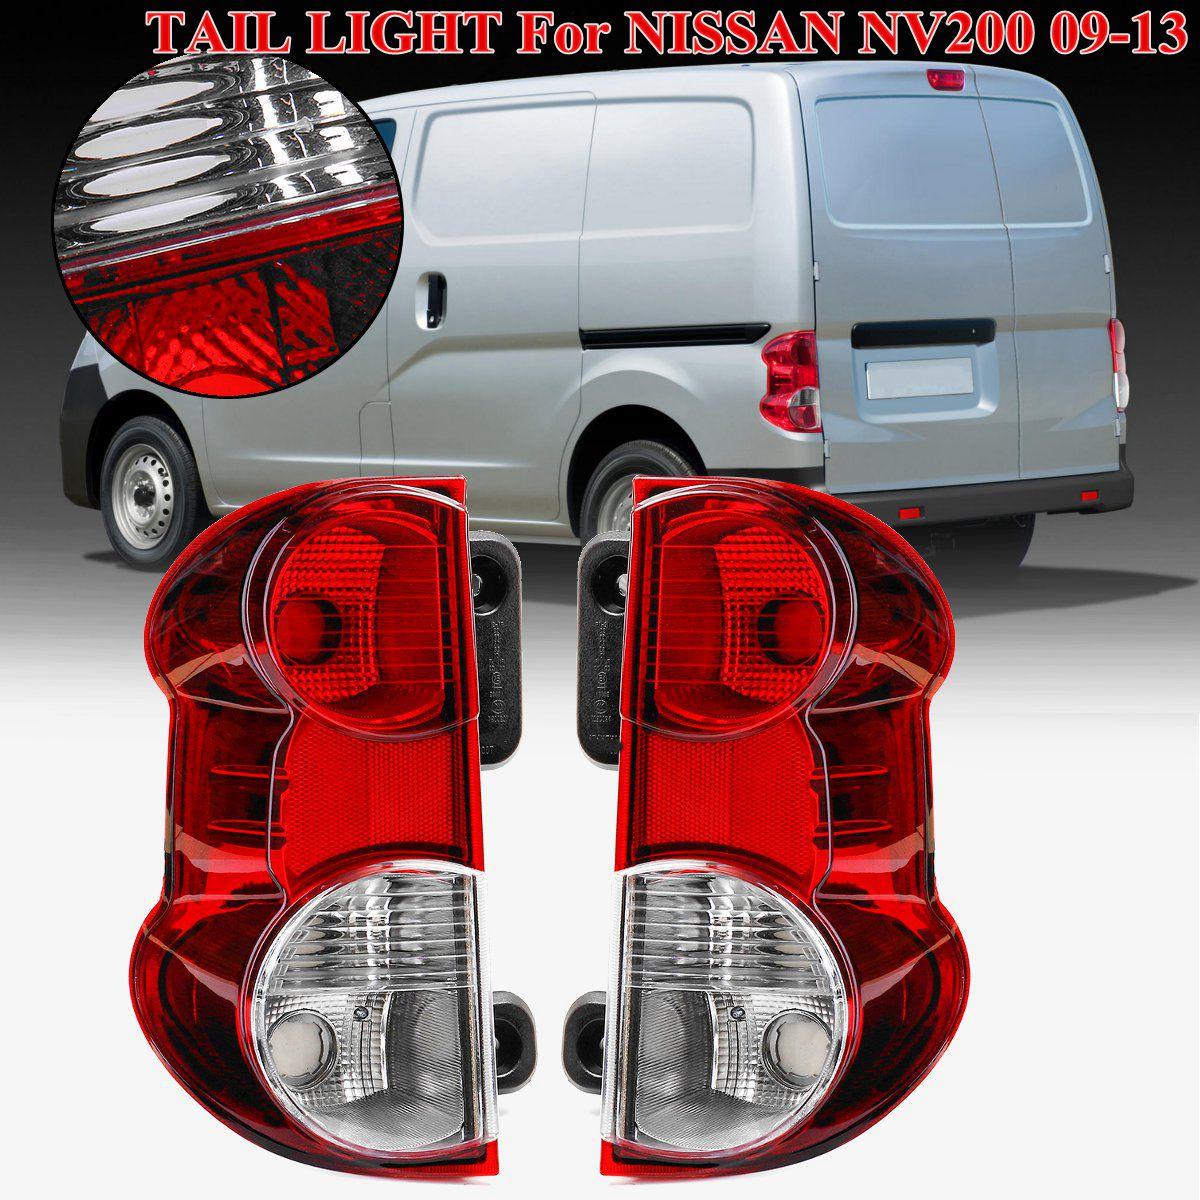 цена на For NISSAN NV200 Tail Light Rear brake light Rear warning lamp 26550-JX00A 26555-JX31A 1Pair Red Rear Tail Light Brake Lamp